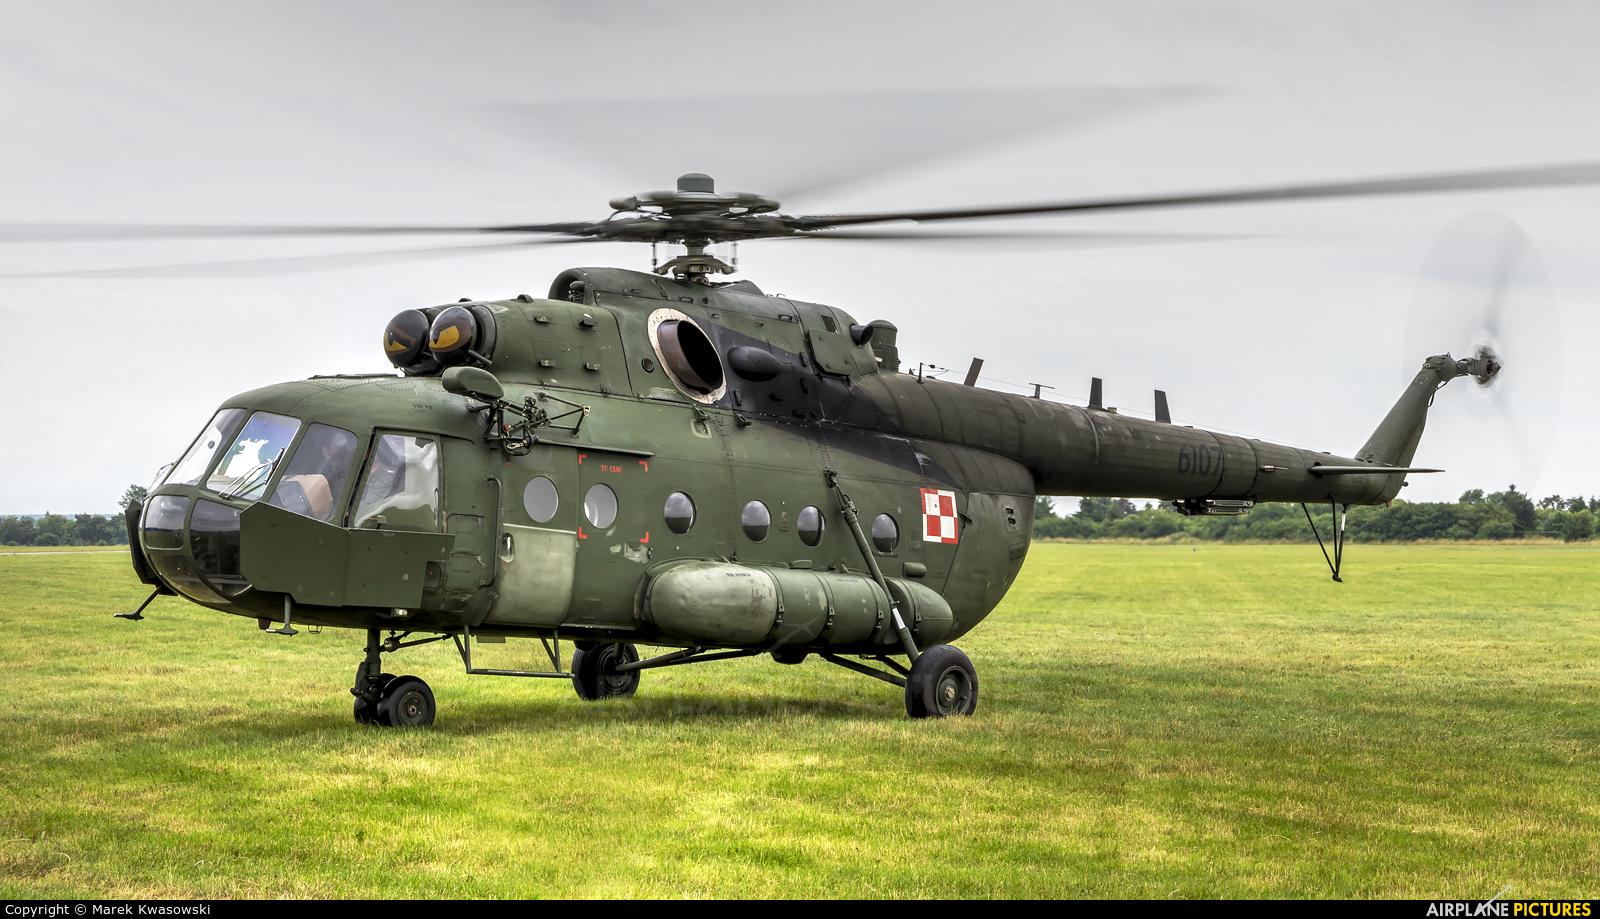 Poland - Army 6107 aircraft at Piotrków Trybunalski